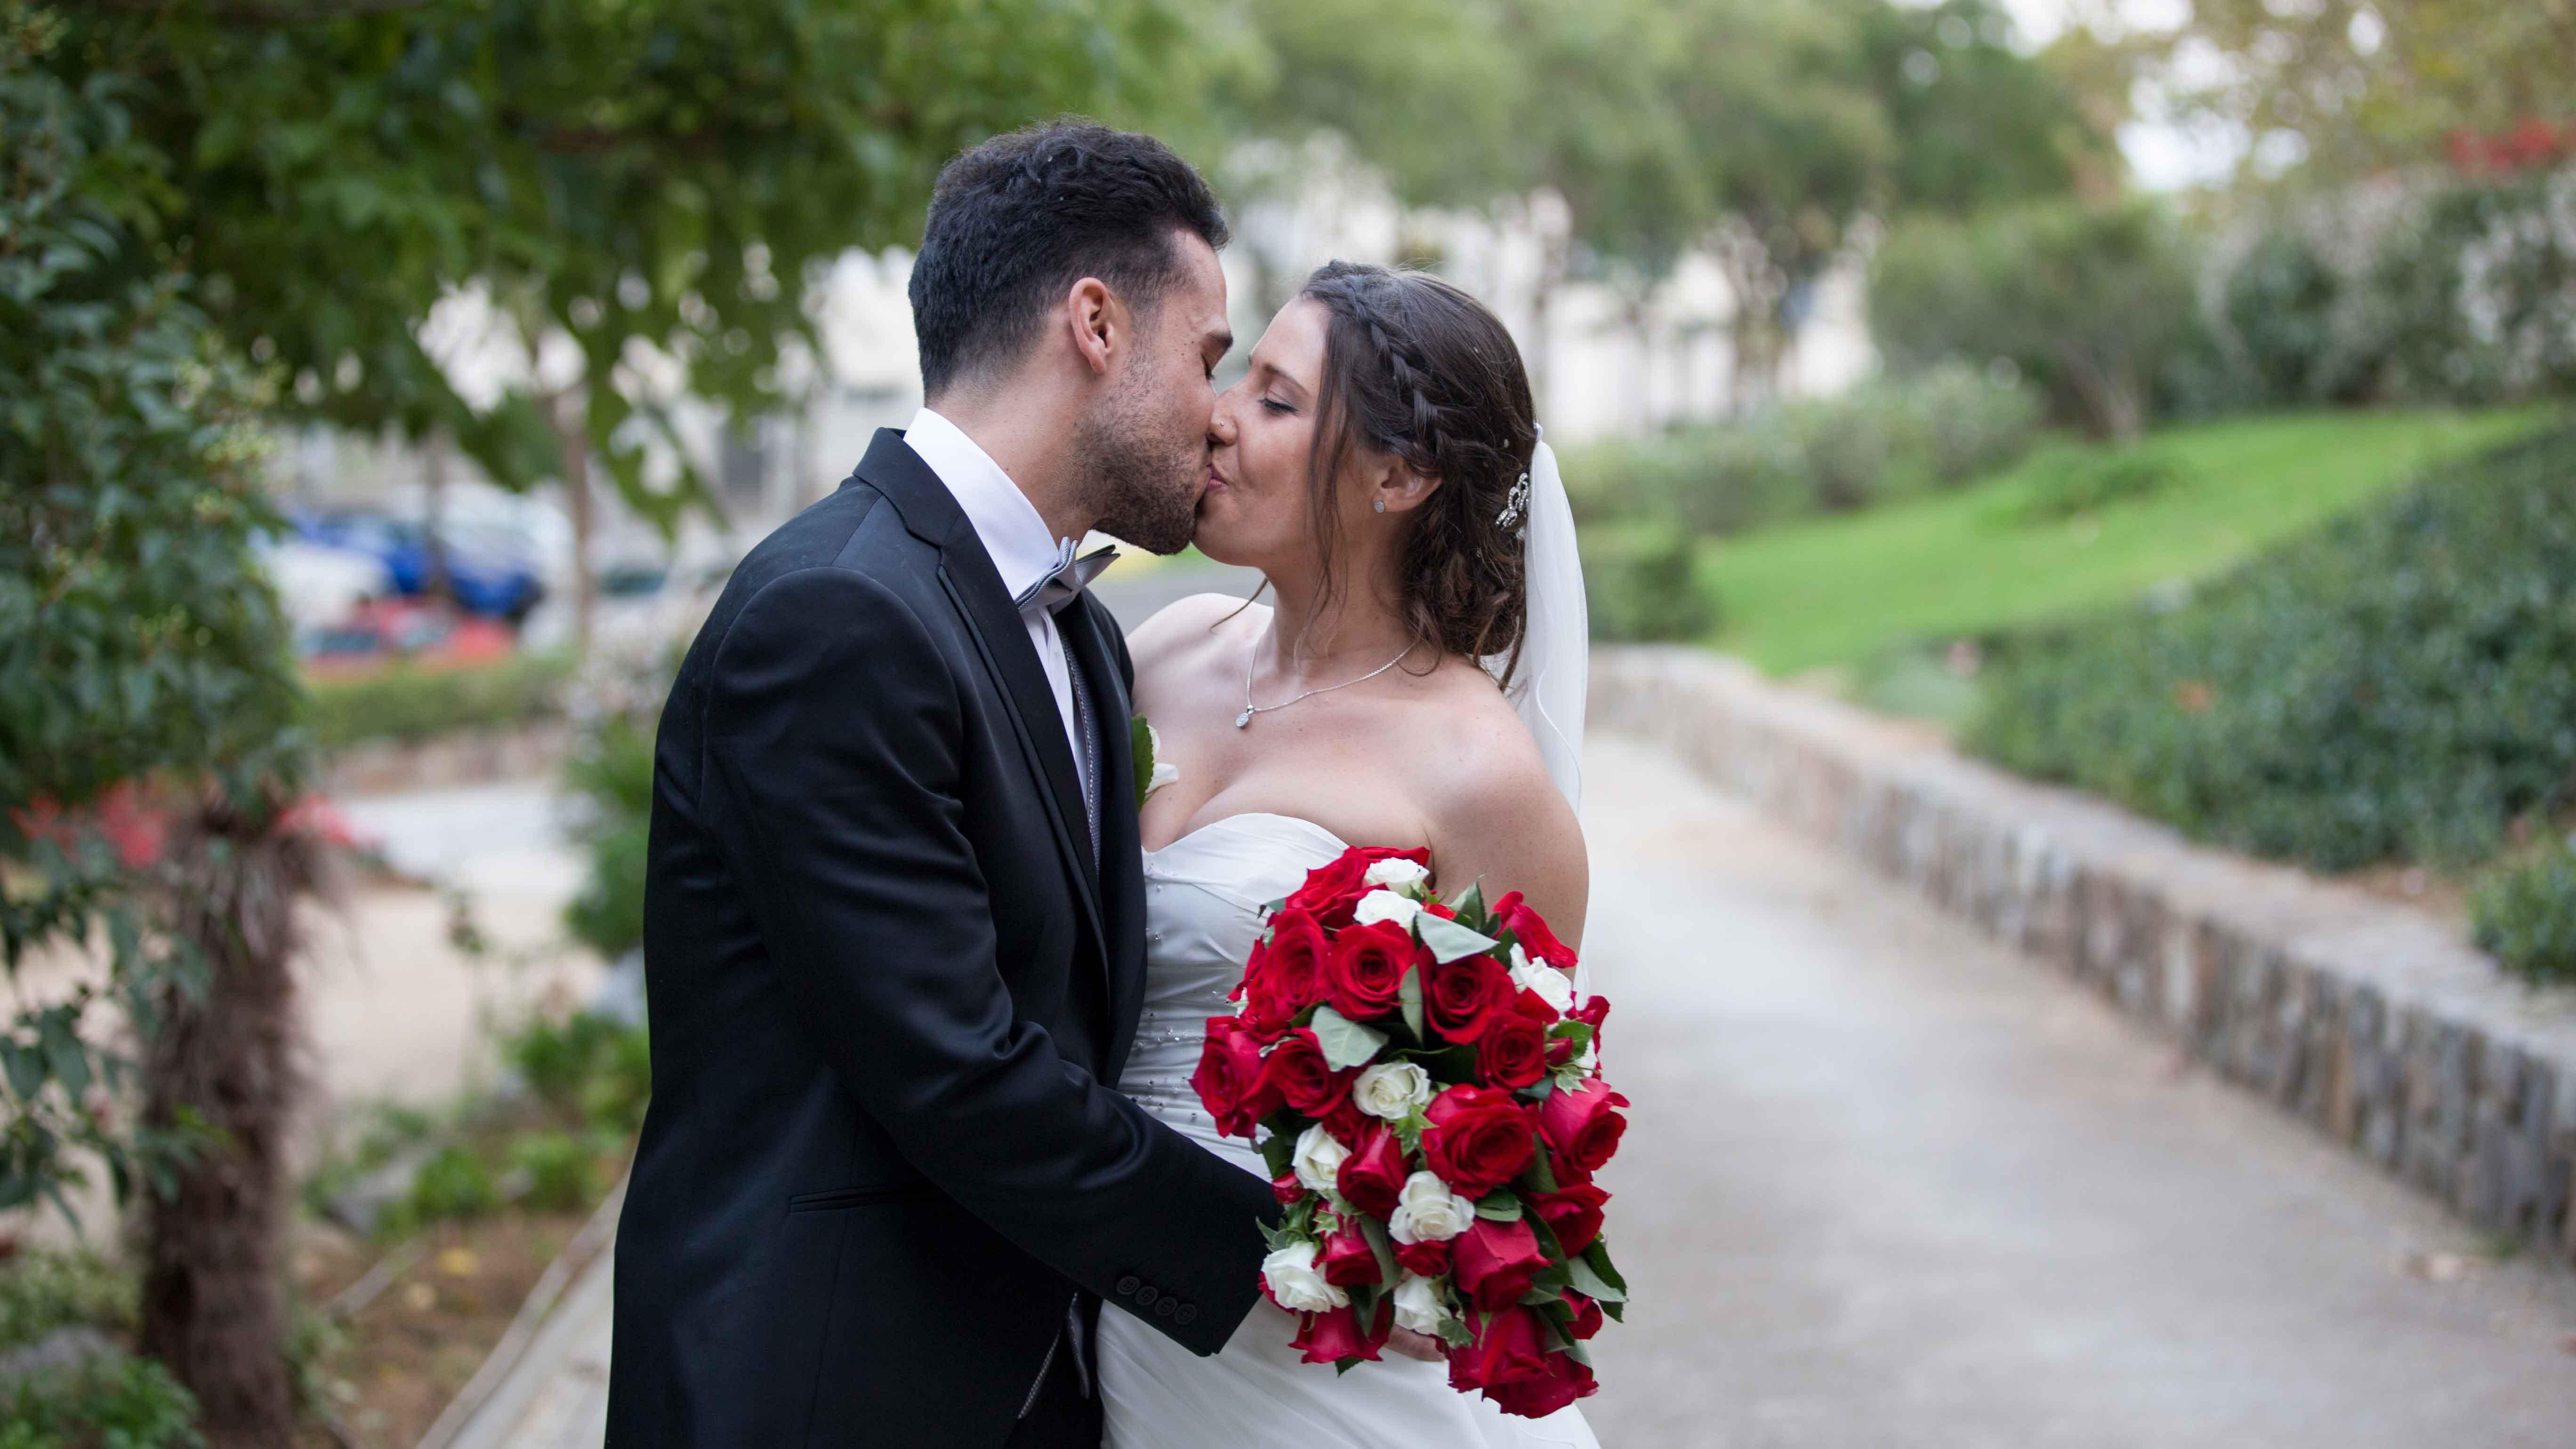 casament-reportatge-nuvis-peto-ram